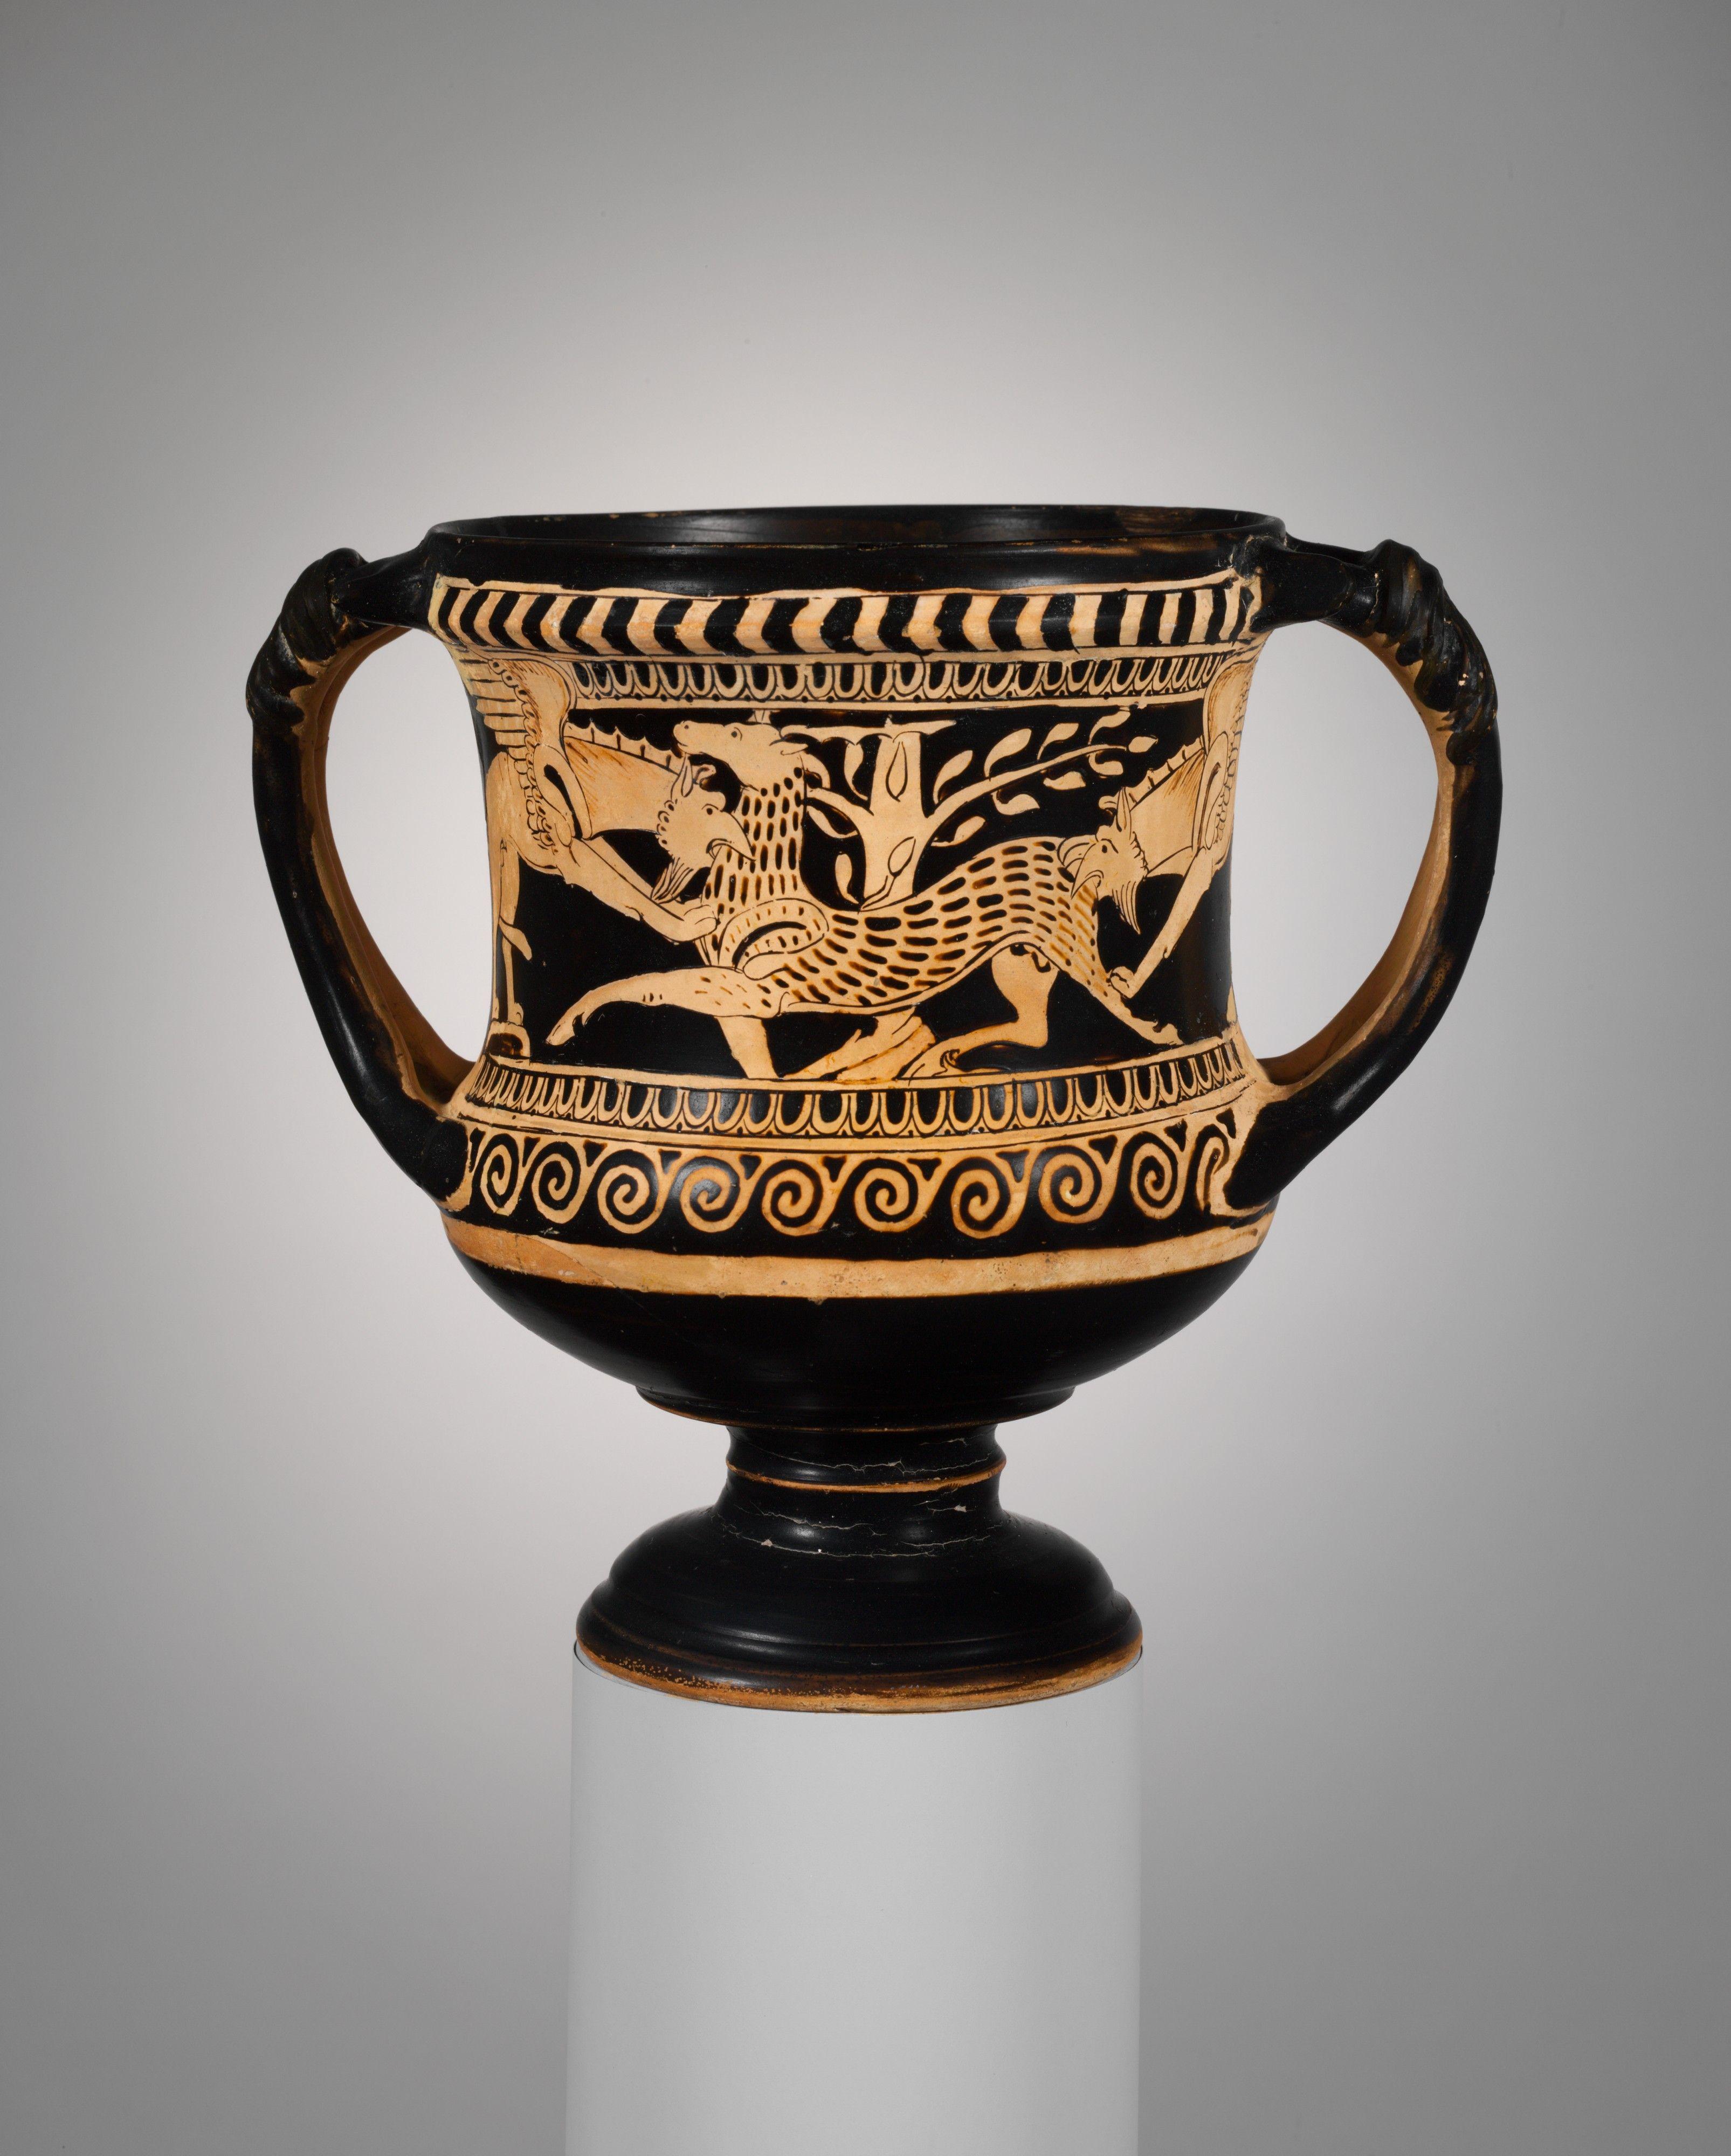 Terracotta Kantharos Drinking Cup Etruscan Late Classical The Metropolitan Museum Of Art Arte De La Antiguedad Arte Etrusco Ceramica Griega